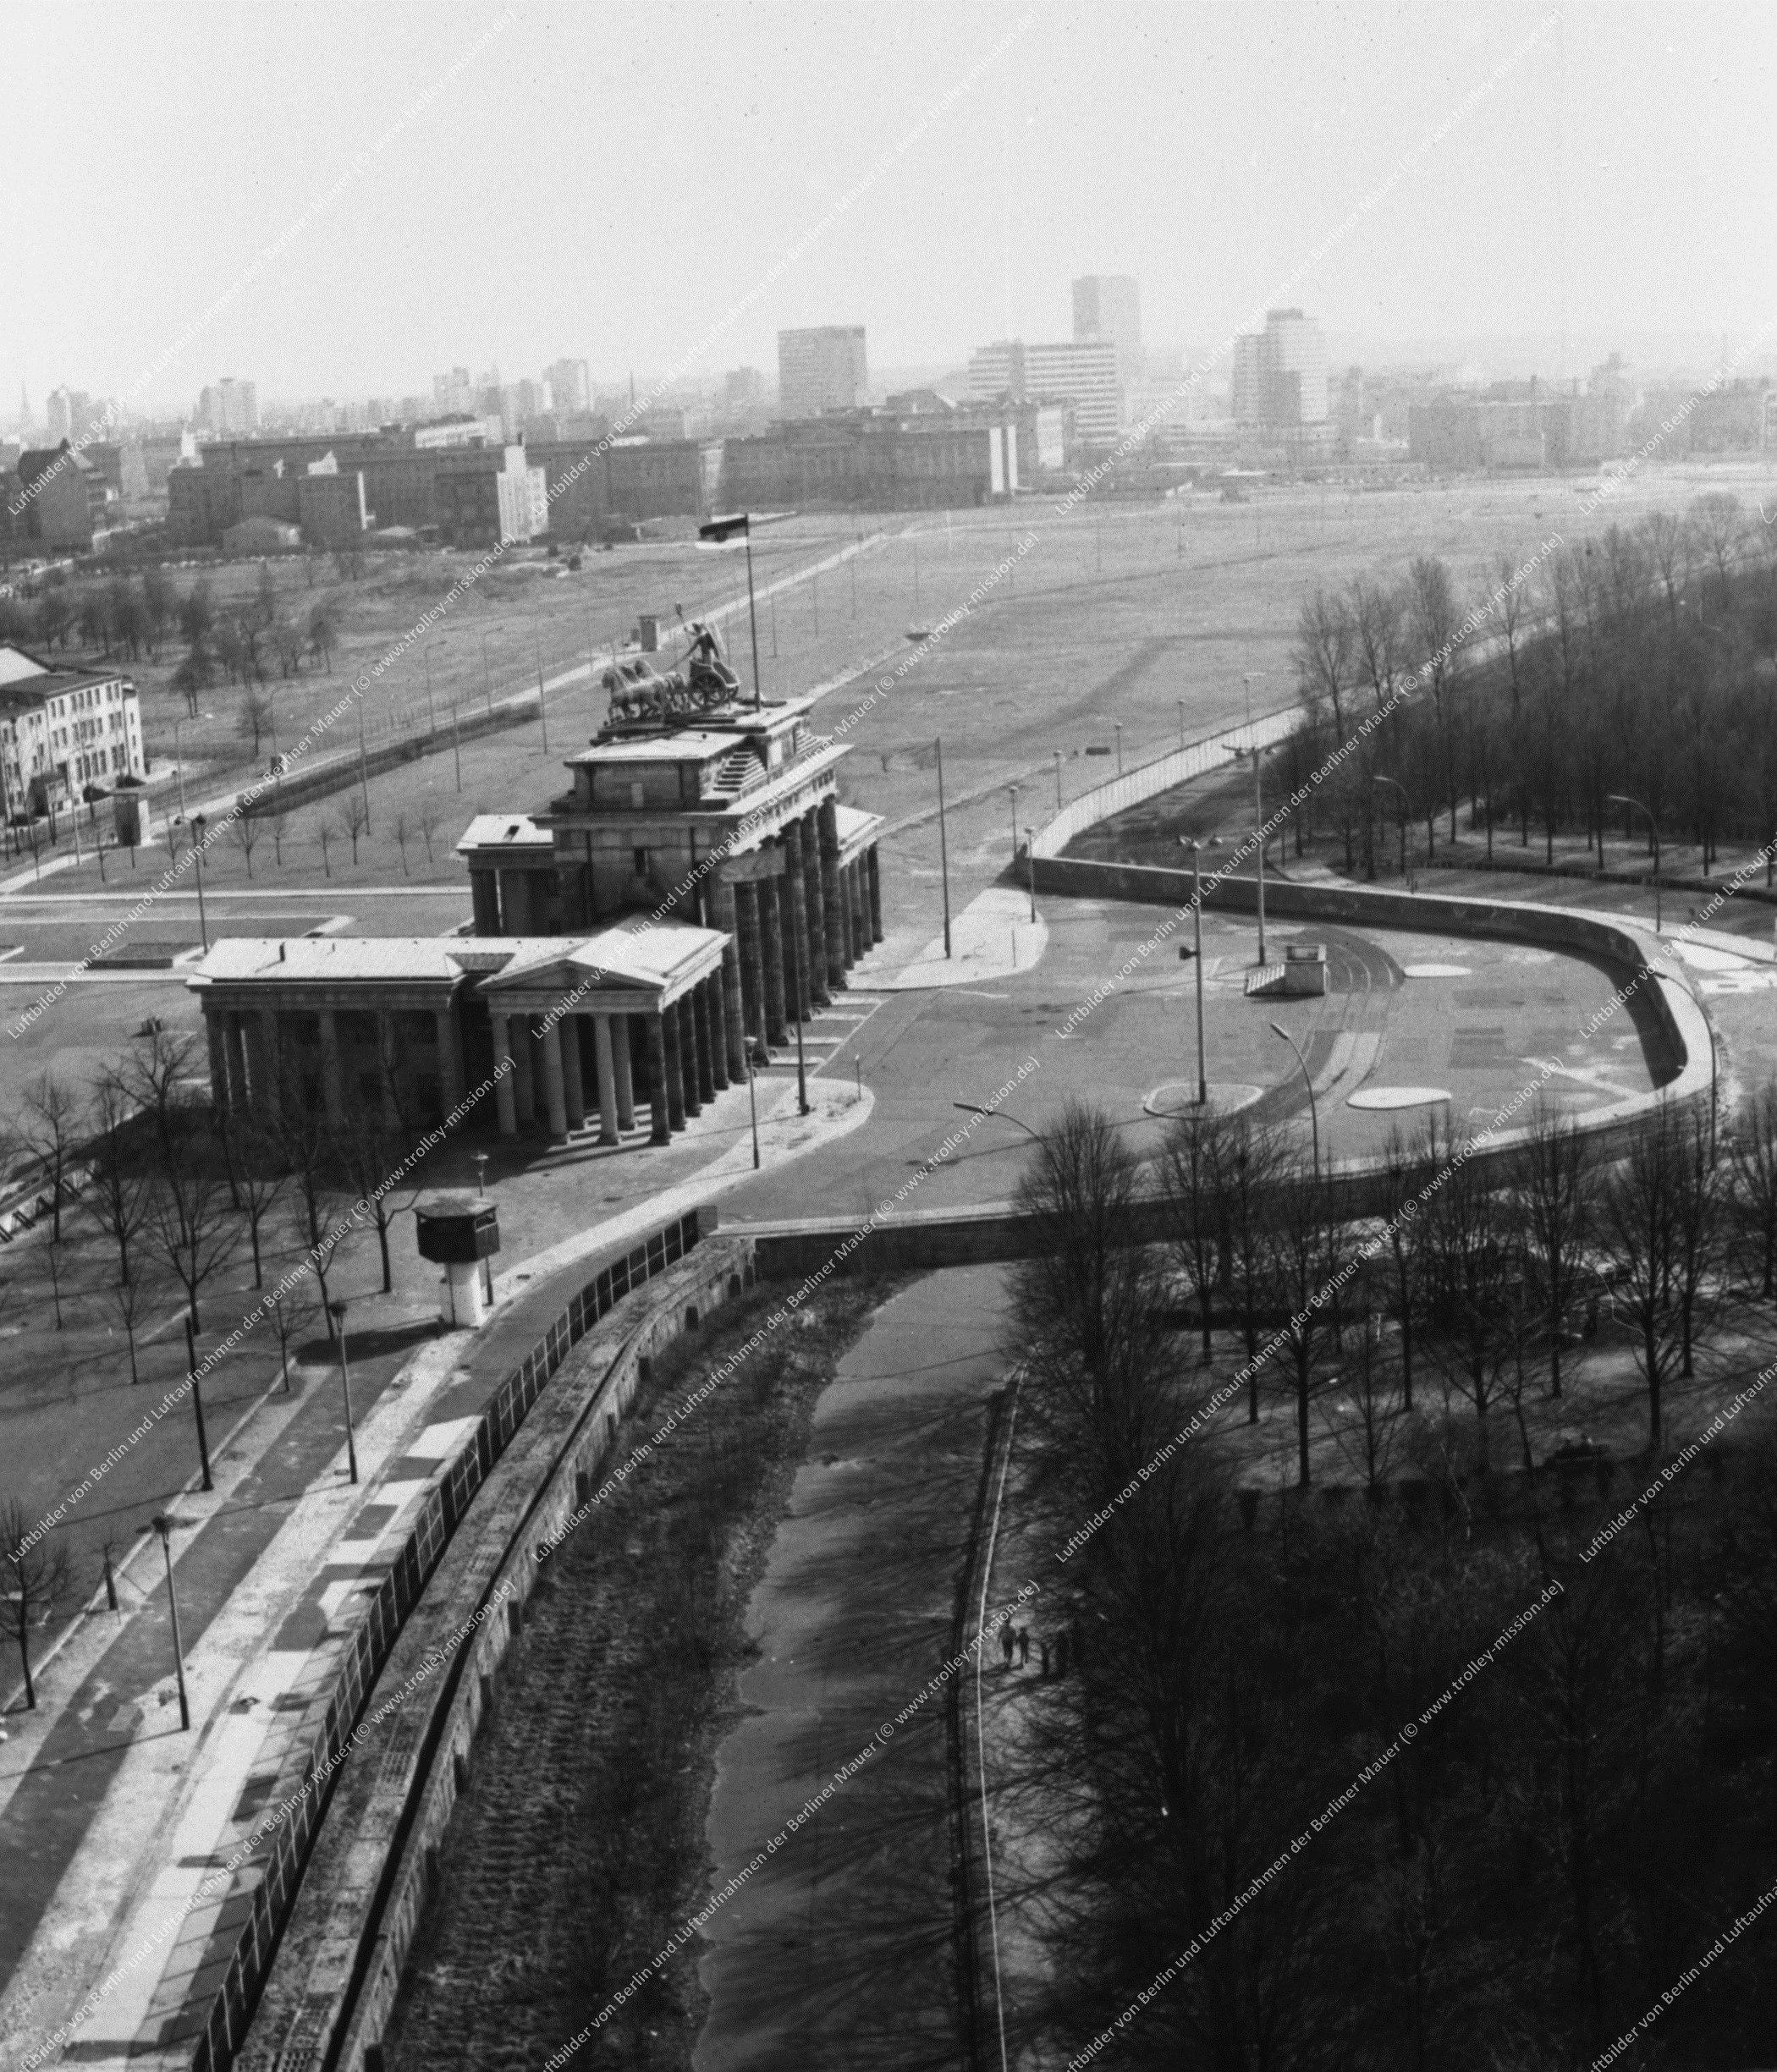 Berlin Luftbild Brandenburger Tor (Bild 011)